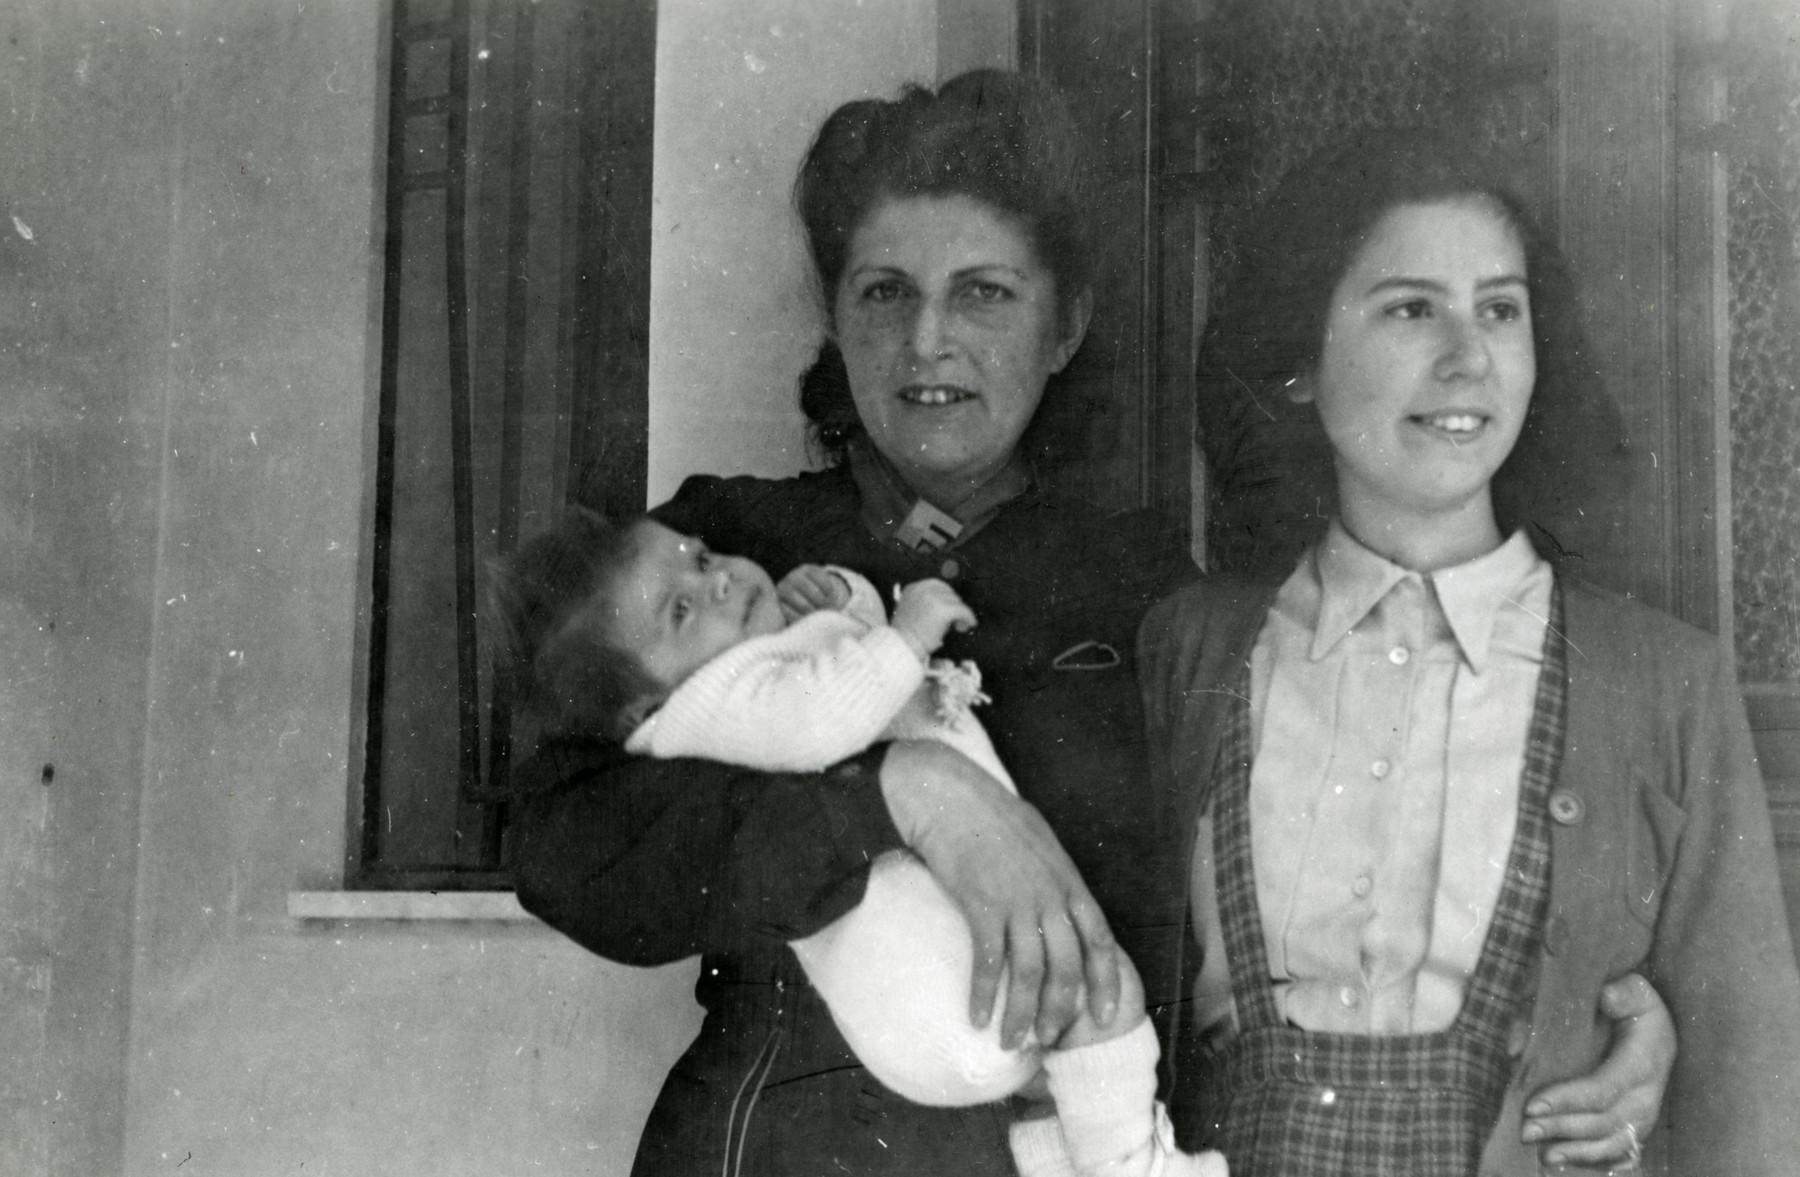 Luba Spiegelglass Fainas holds her newborn son Georges while standing next to her older daughter Renee.